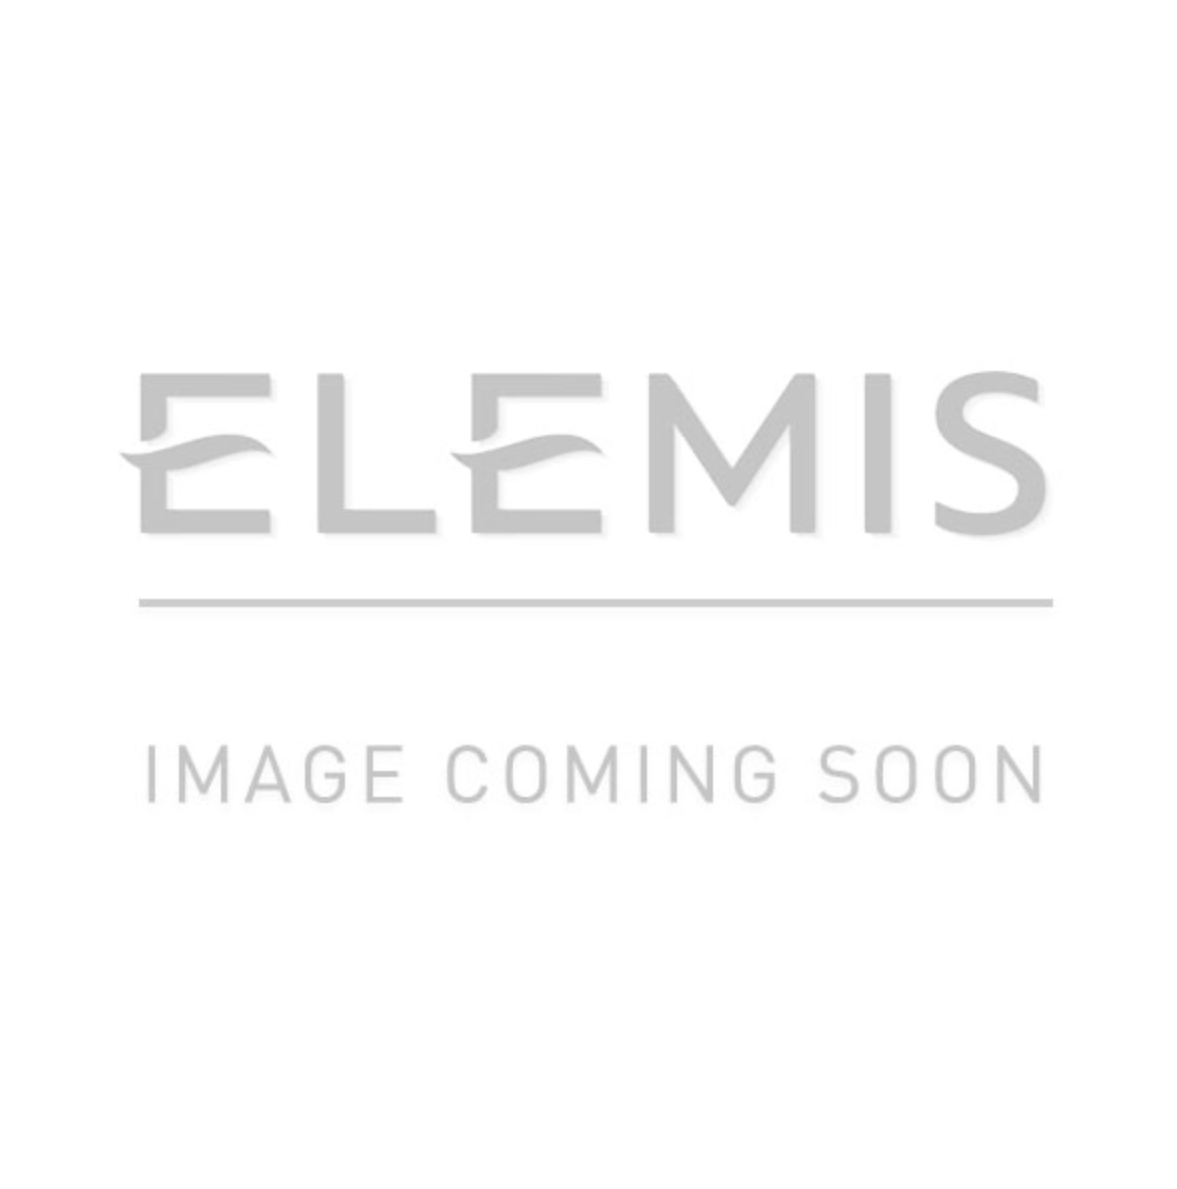 elemis pro collagen deals